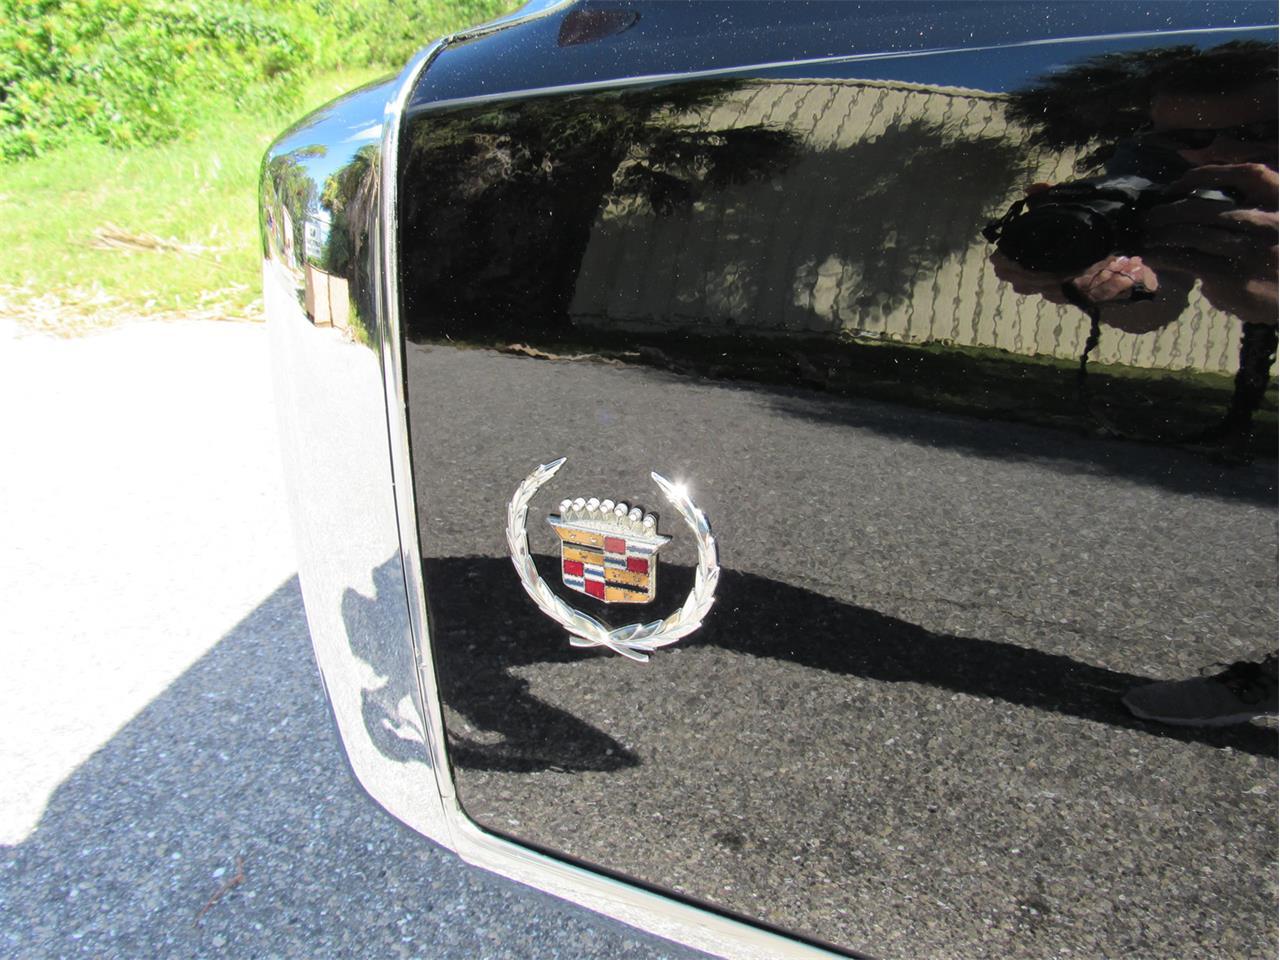 Large Picture of 1963 Cadillac Eldorado Biarritz located in Sarasota Florida - $39,900.00 Offered by Vintage Motors Sarasota - M3NM